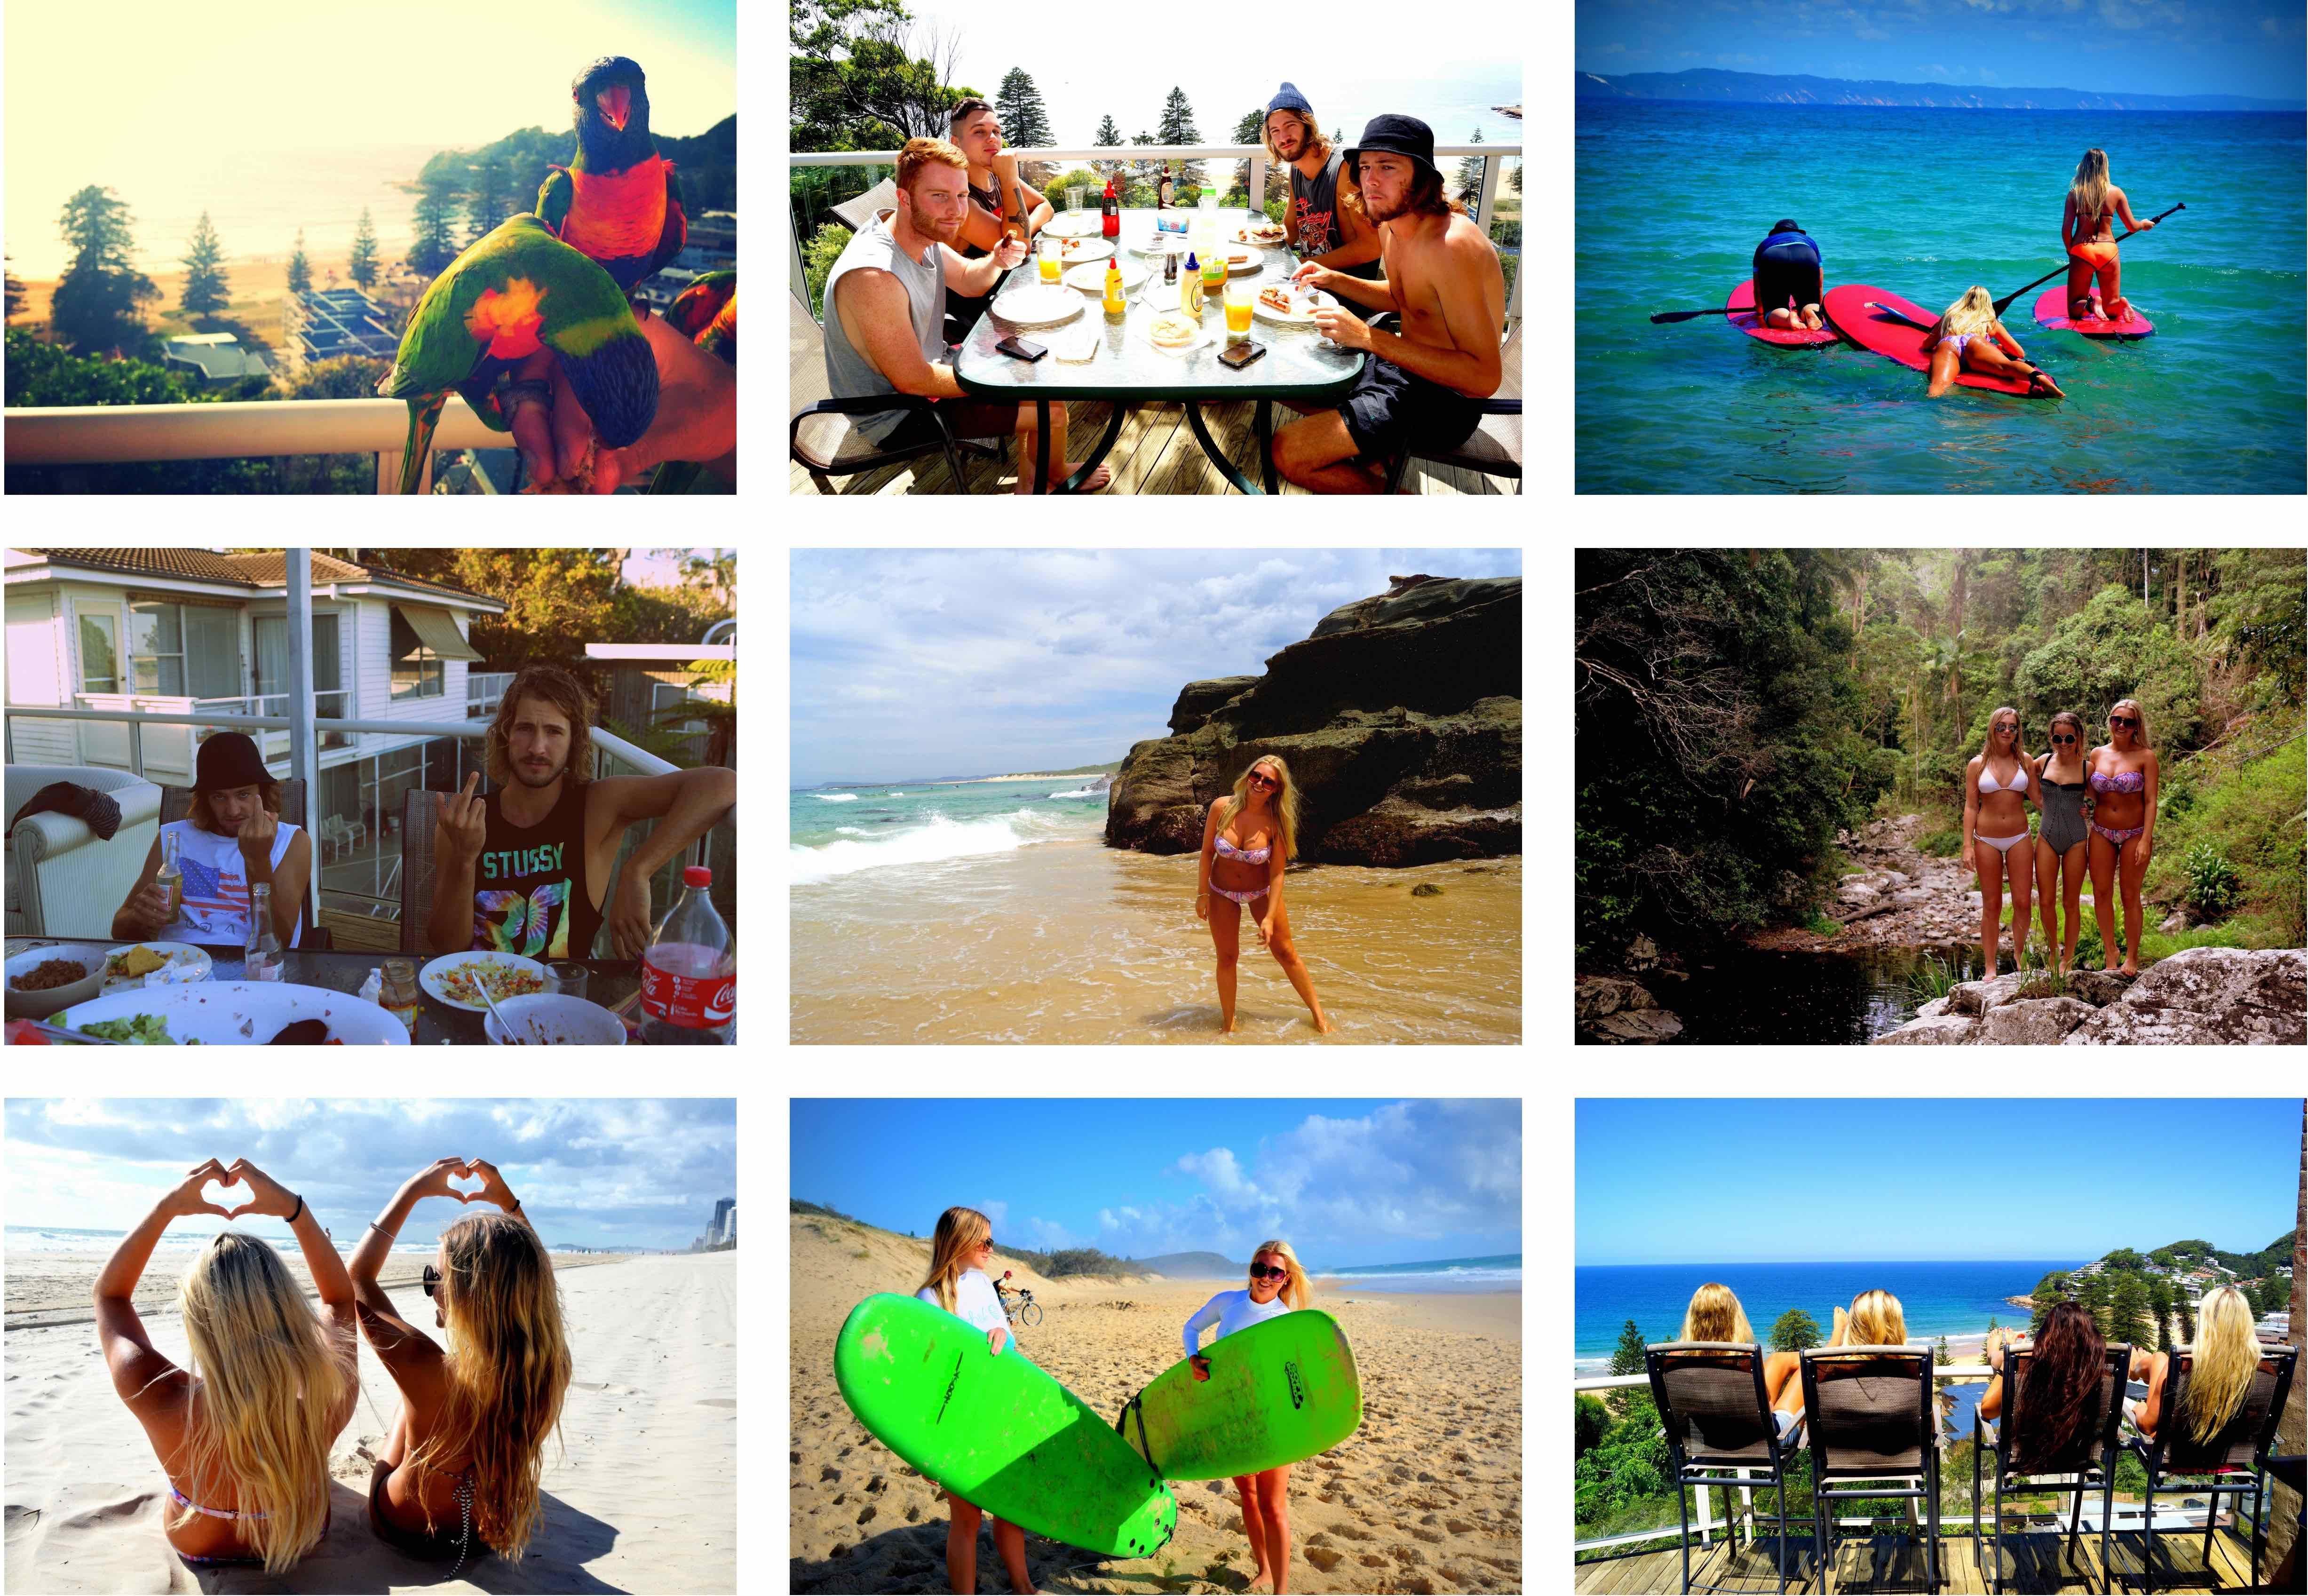 NOOSA SURFERS PARADISE